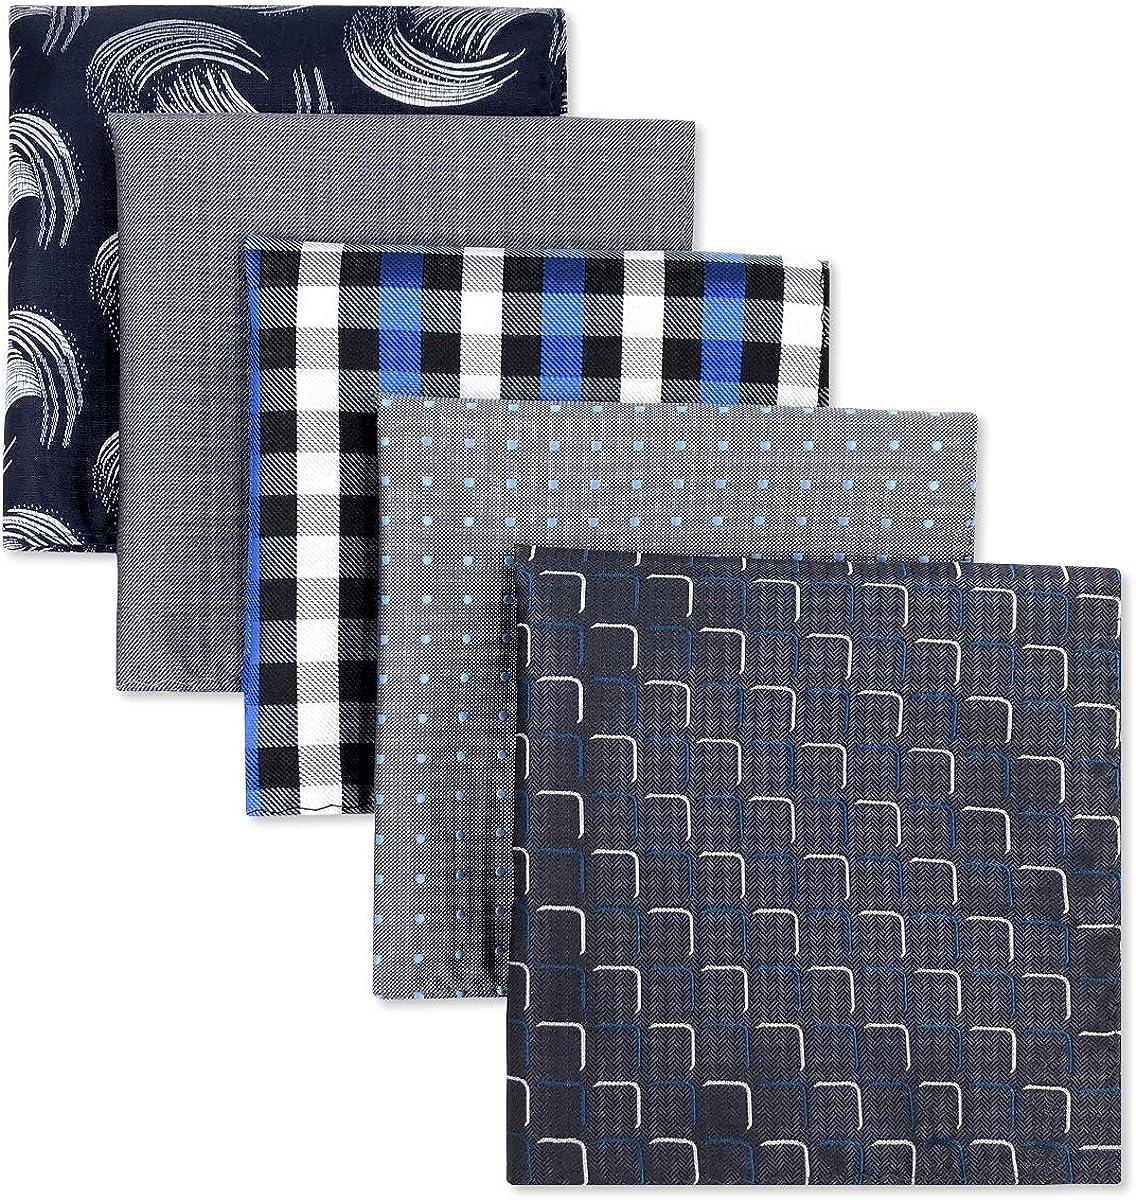 SHLAX&WING 5 Pieces Assorted Mens Silk Pocket Square Handkerchiefs Set Lot